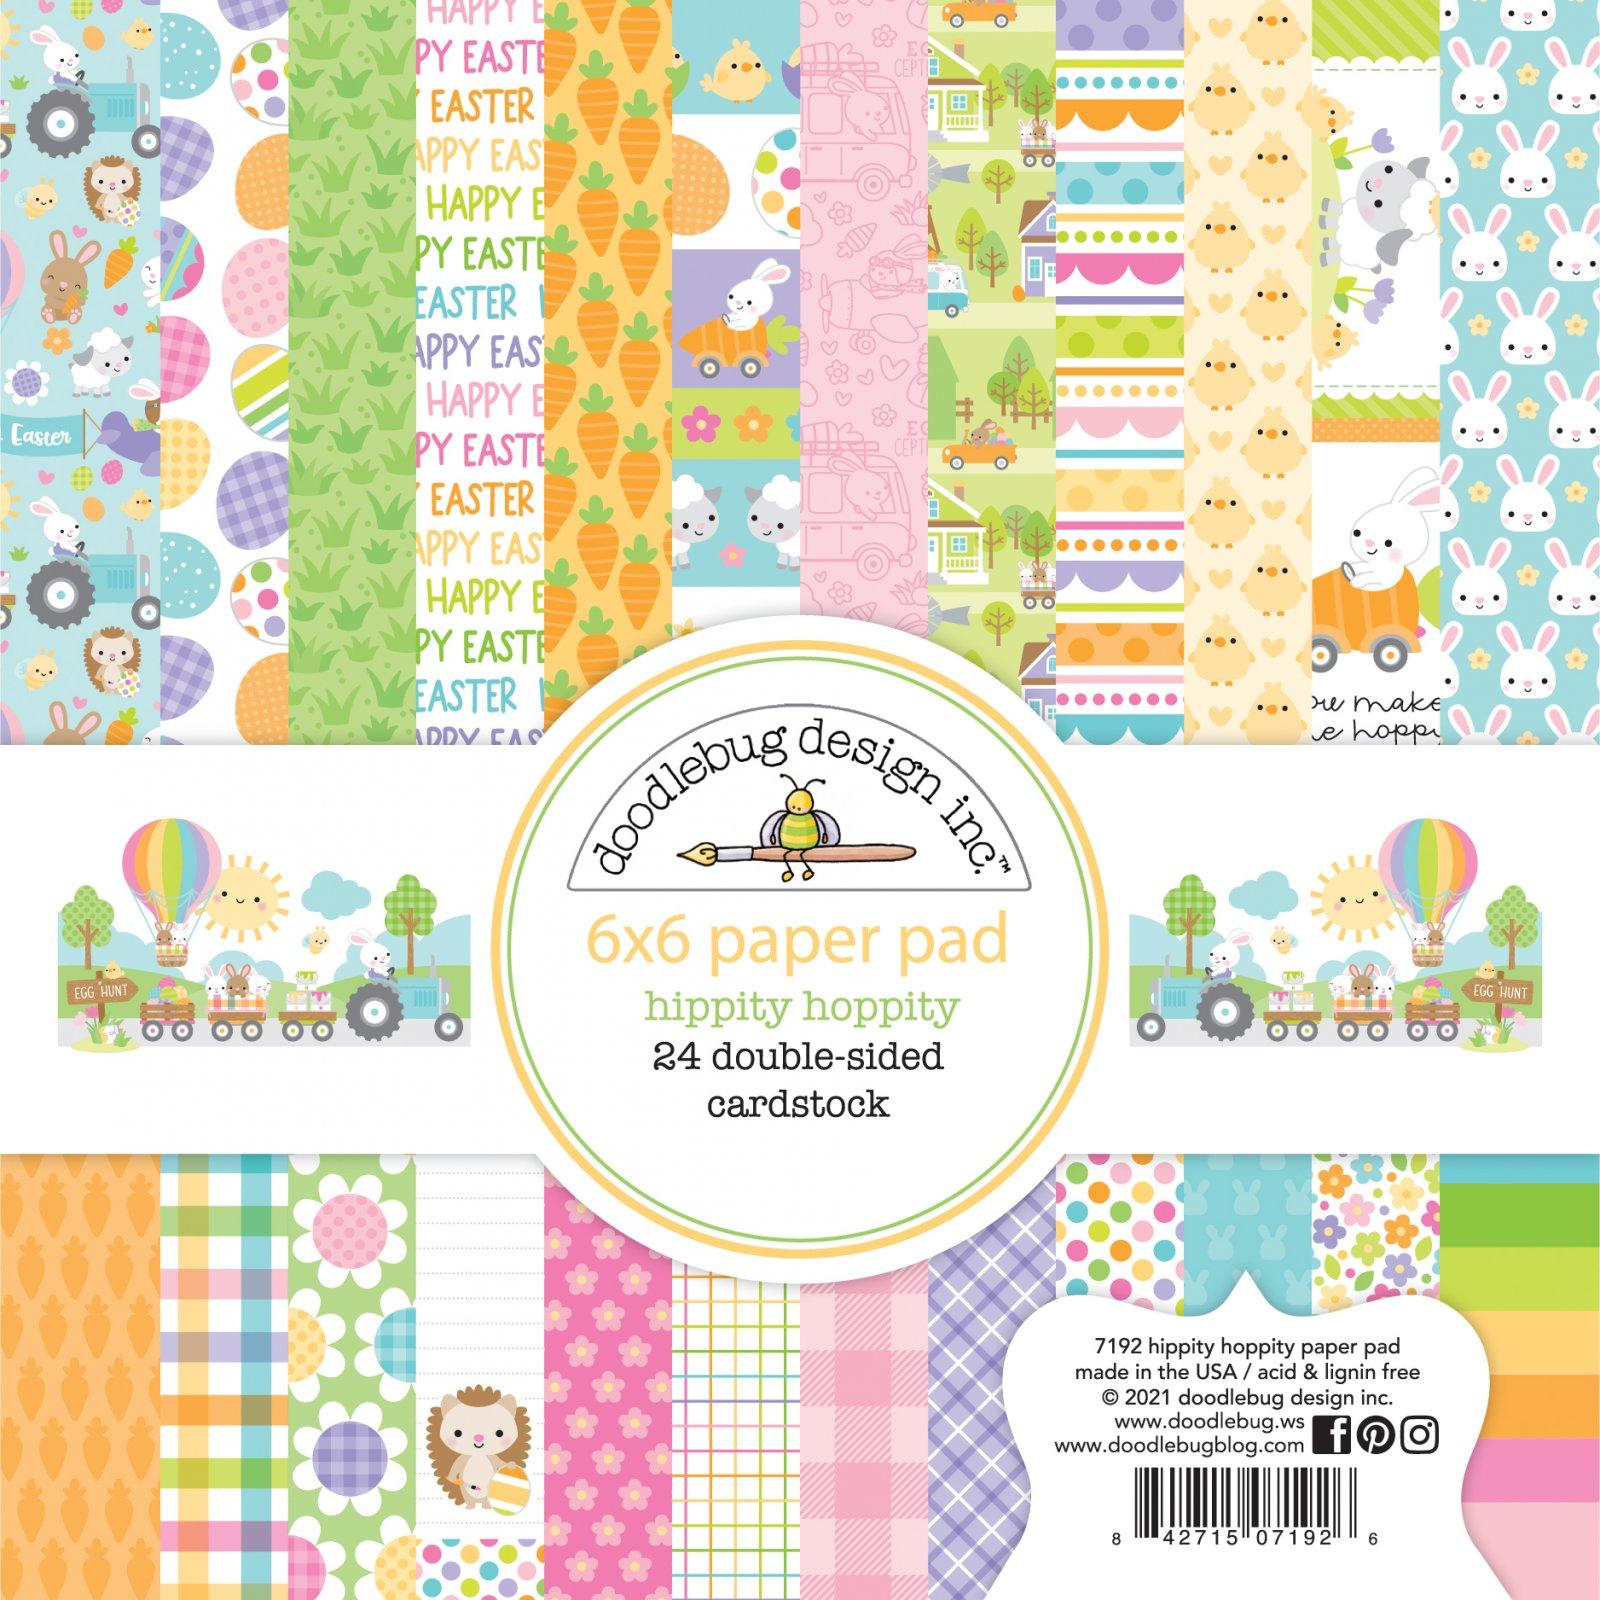 Doodlebug Hippity Hoppity 6 x 6 Paper Pad